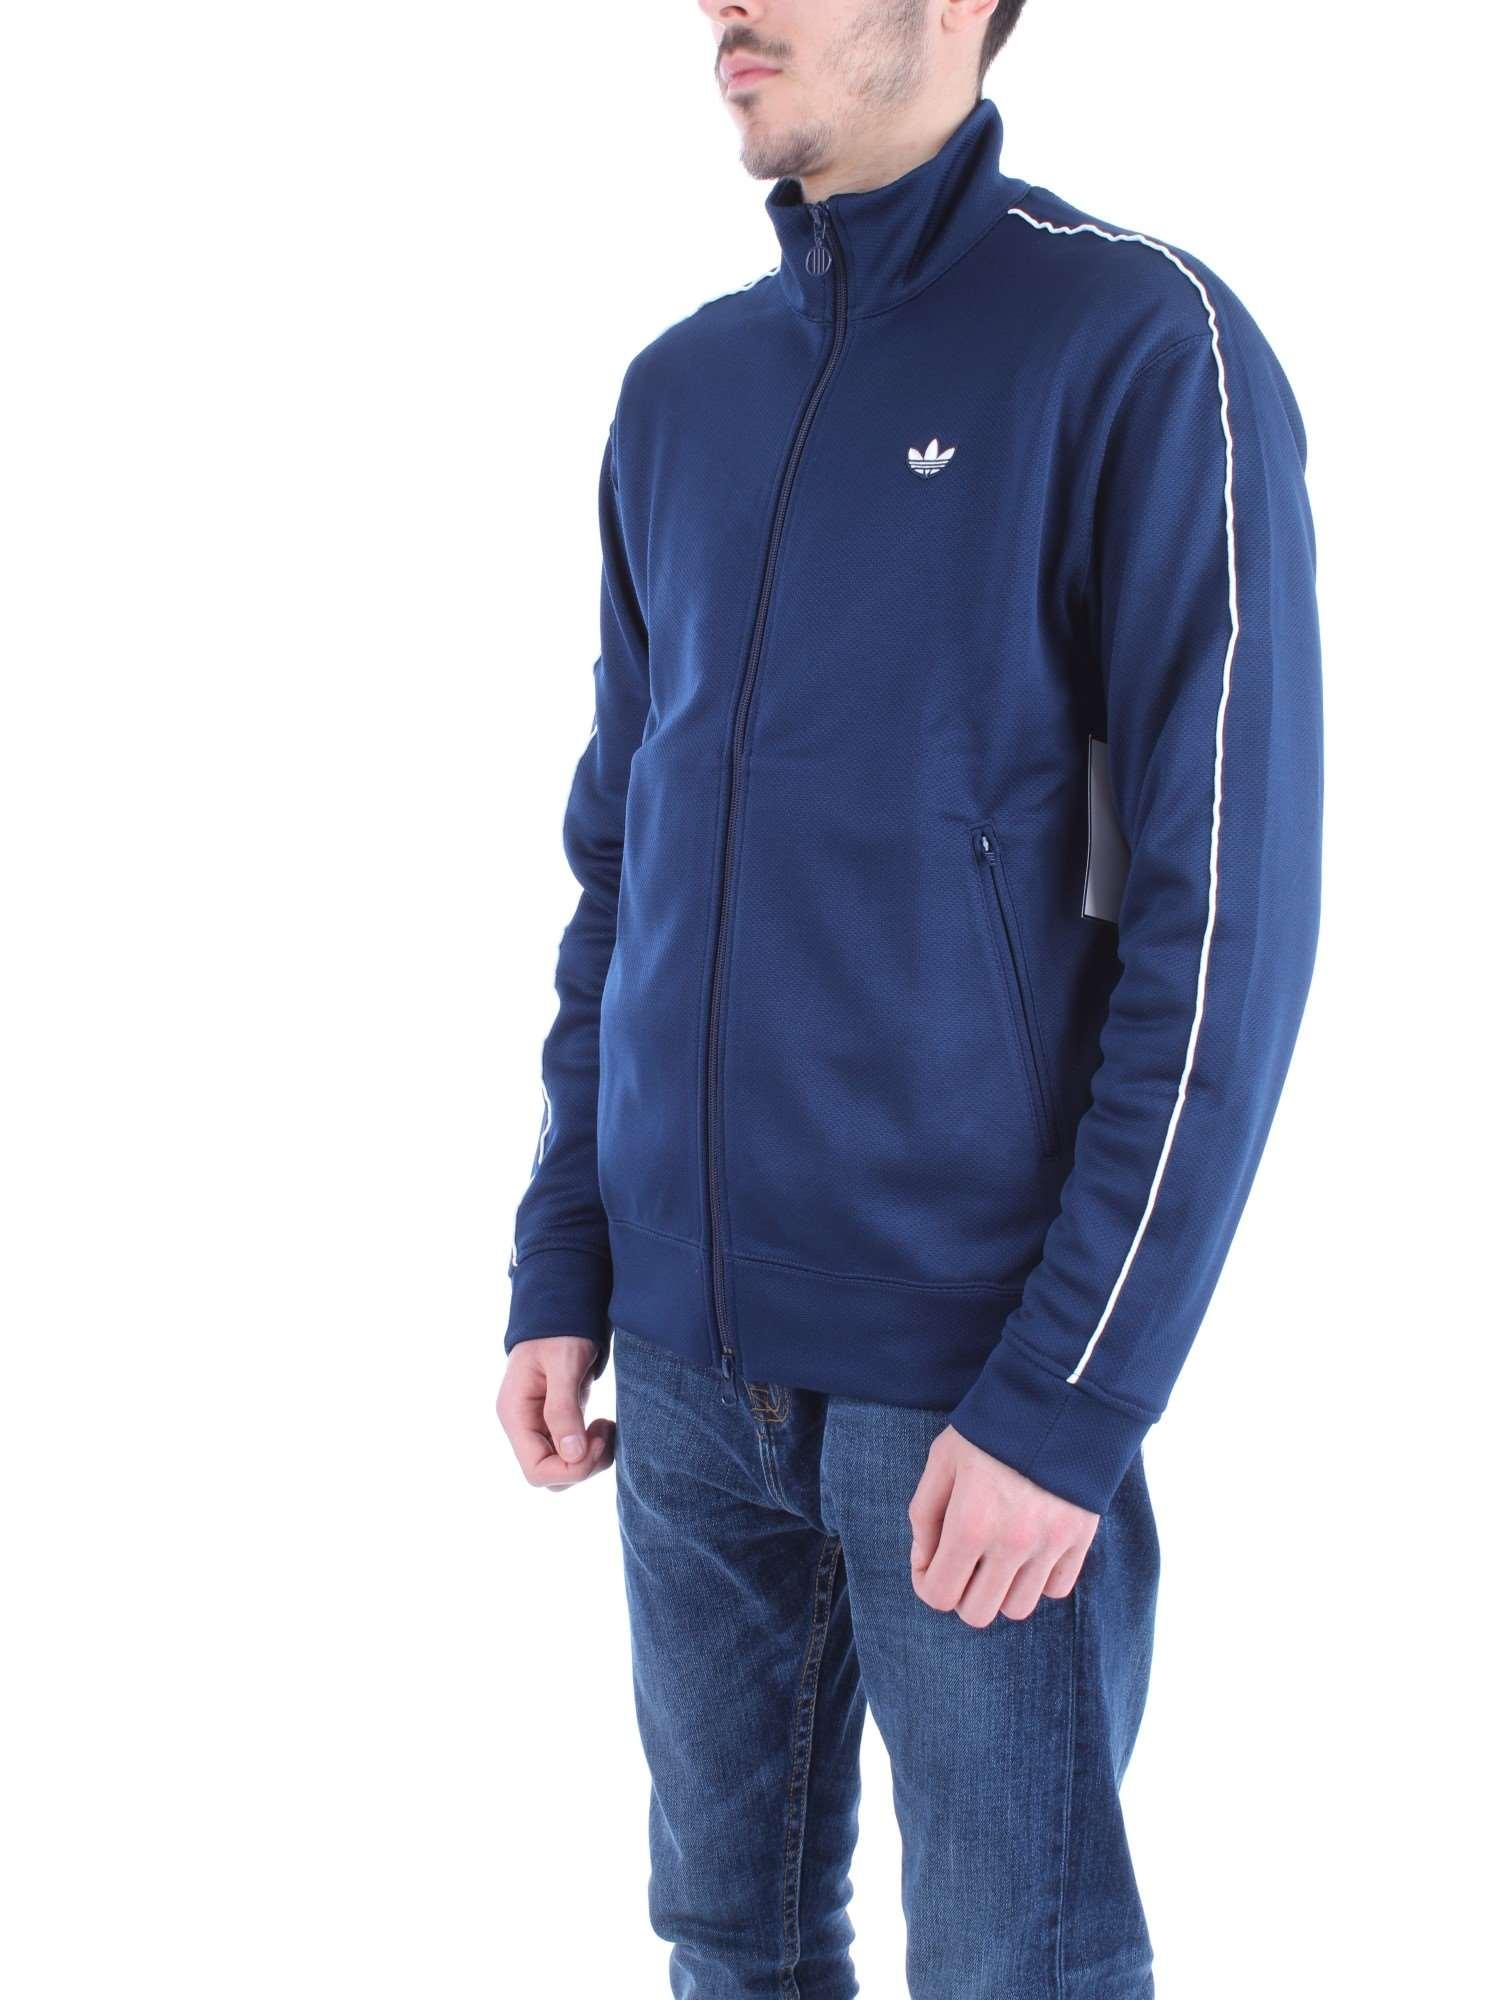 Zomer Du7843 Adidas Heren Blue Lente sweater fnwFYq